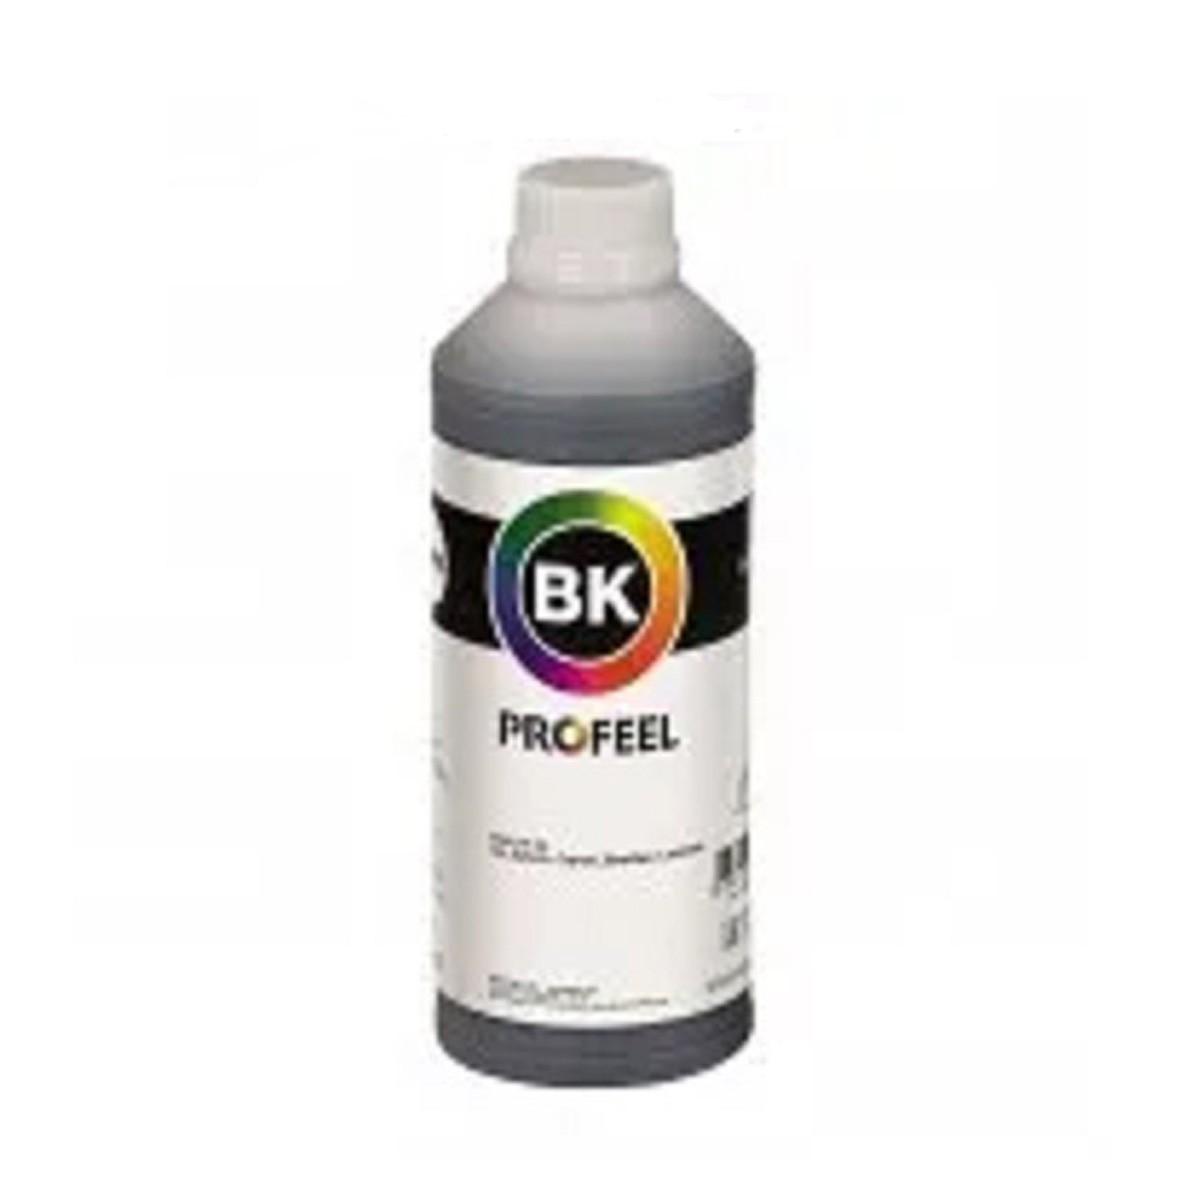 Tinta Epson Preta Profeel - E0017-01LB Corante - 1 Litro